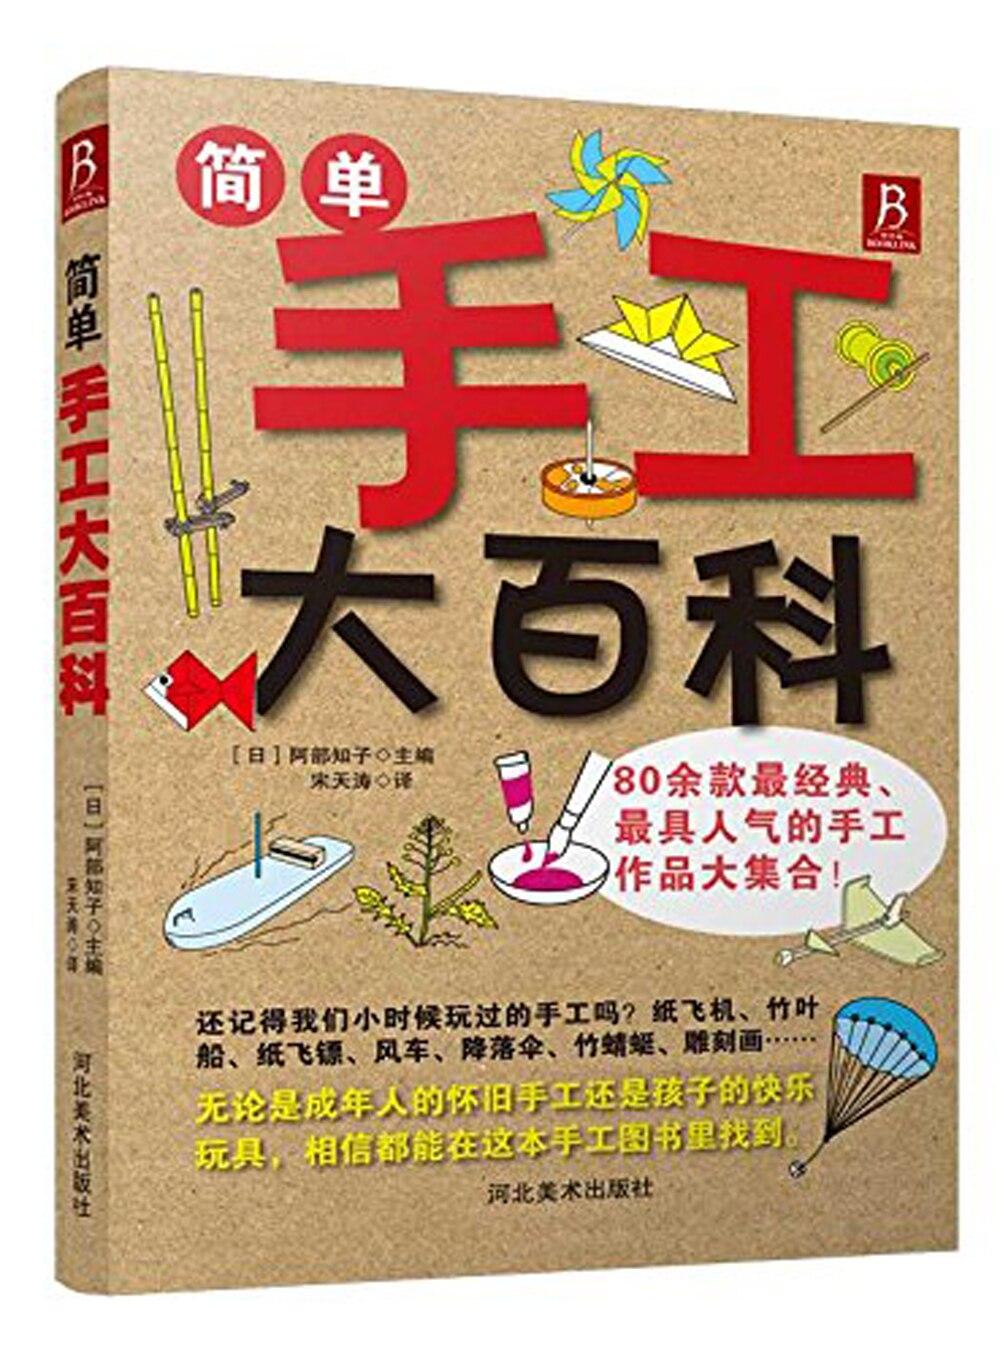 Manual Simple enciclopedia/chino hecho a mano Carft libro